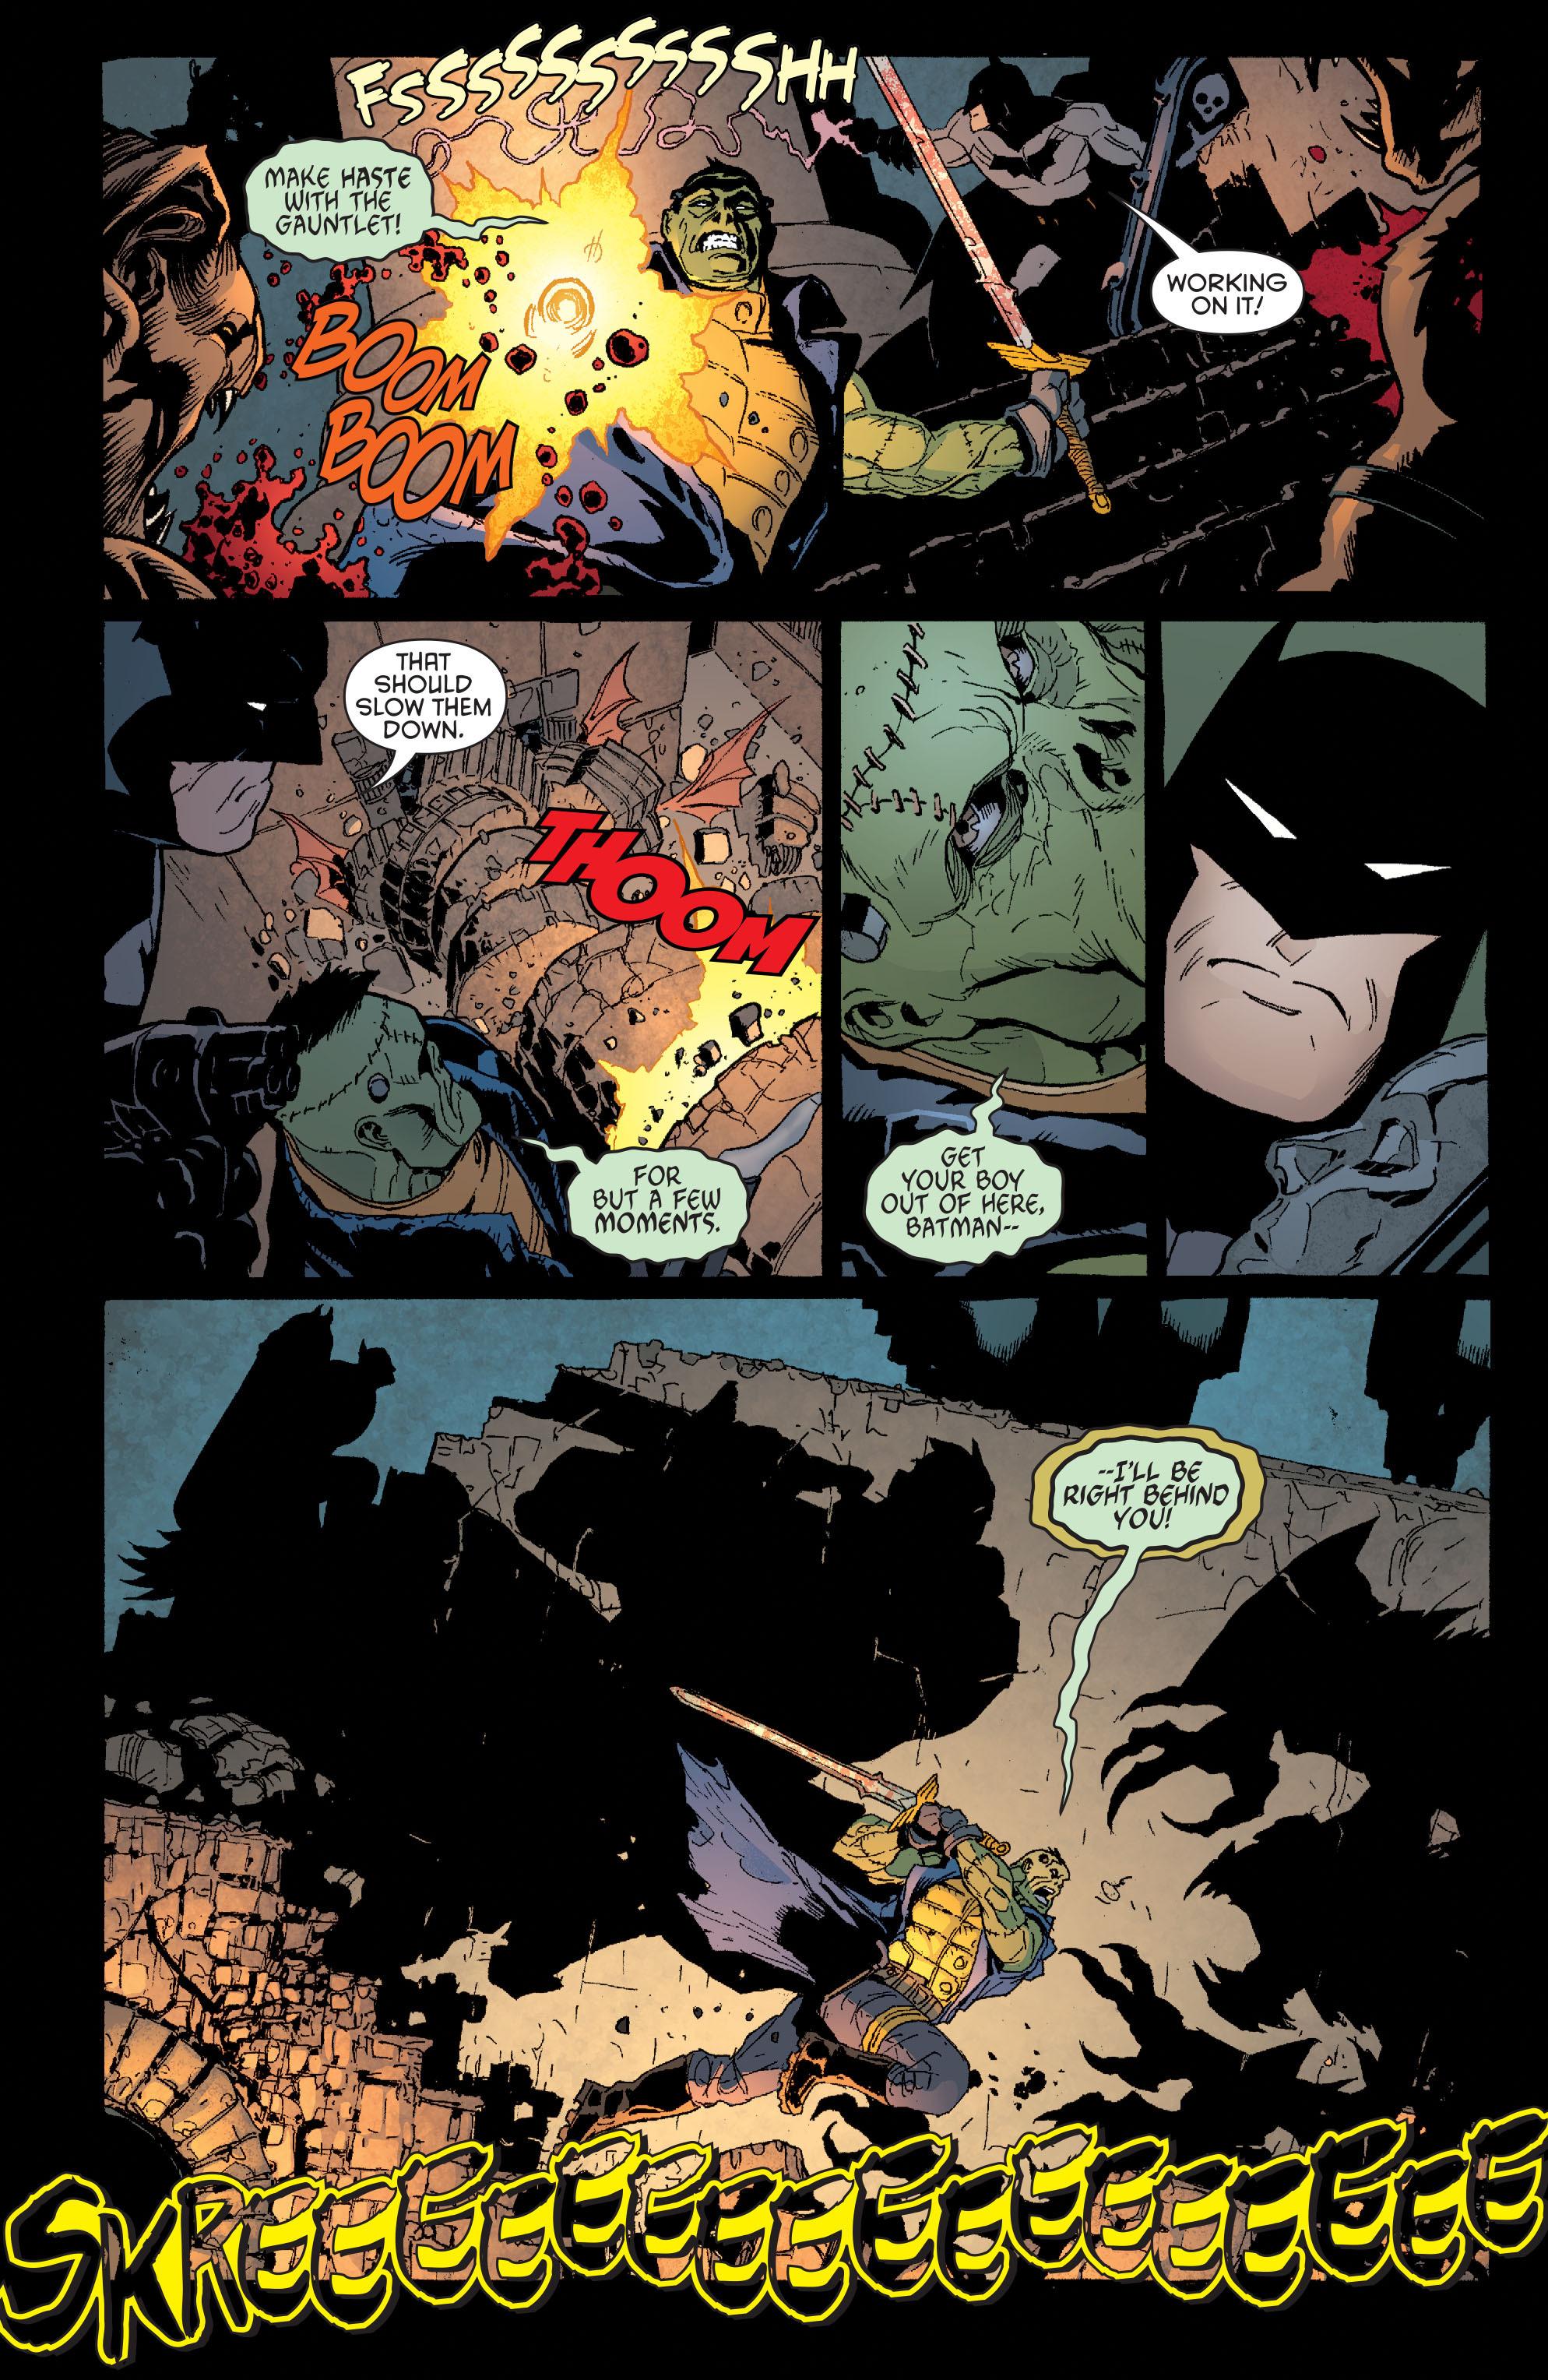 Read online Batman and Robin (2011) comic -  Issue #32 - Batman and Ra's al Ghul - 10